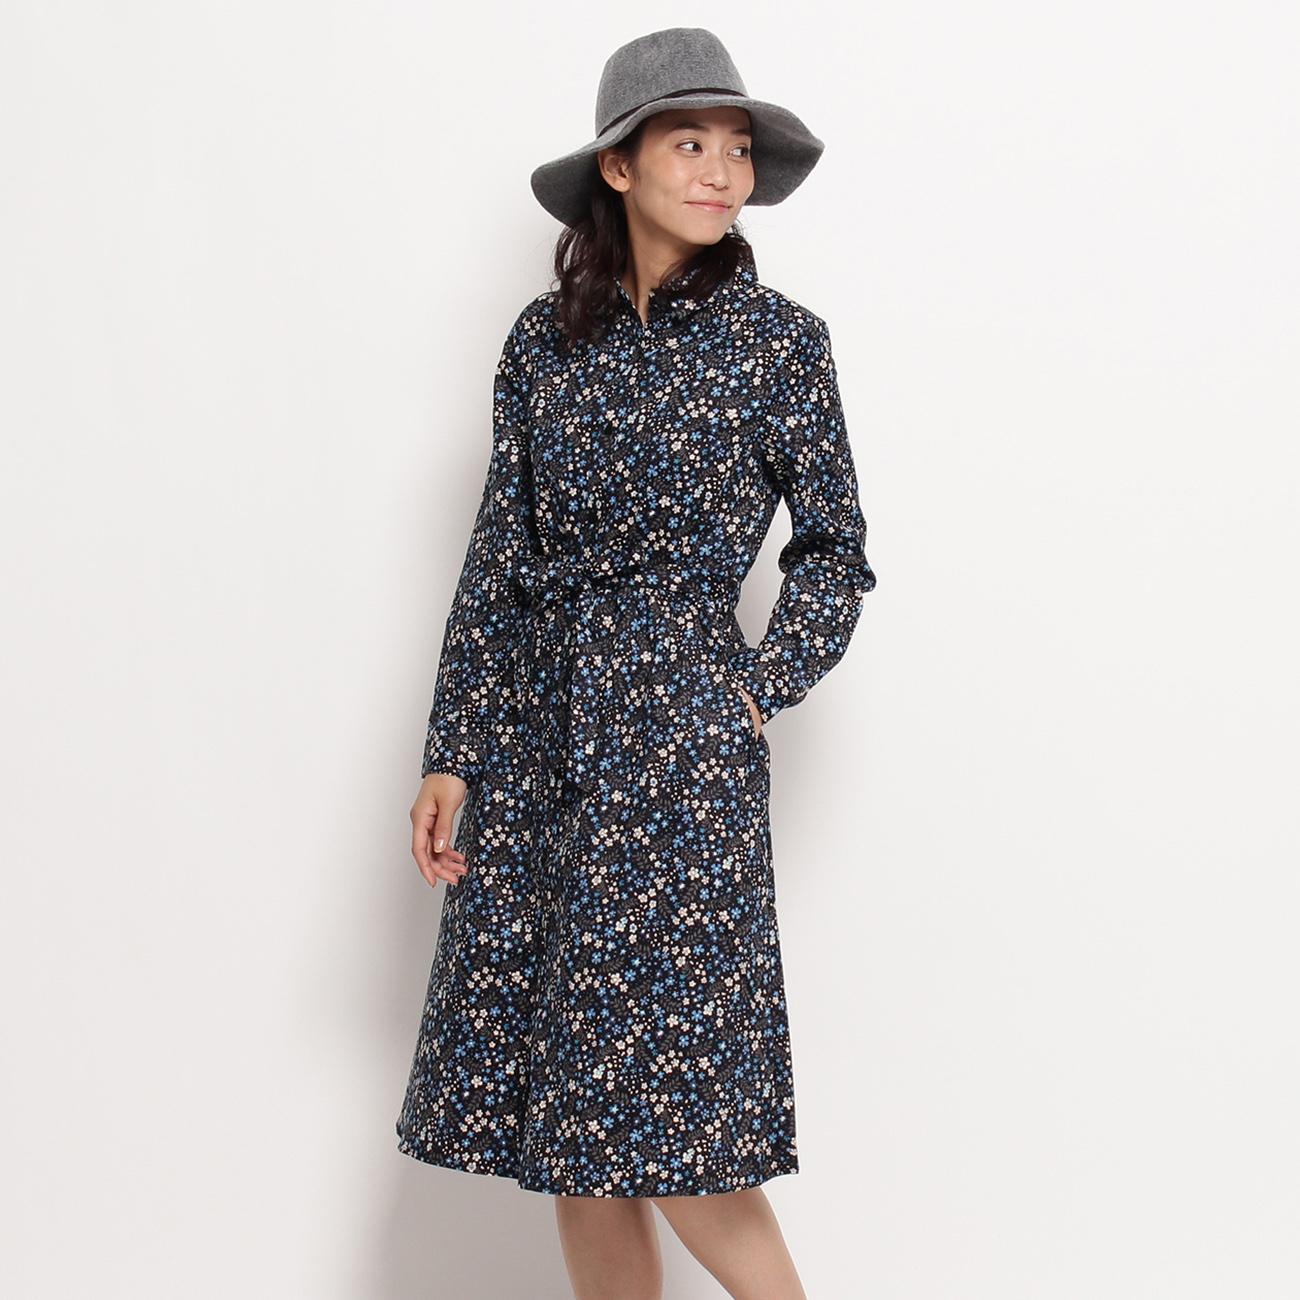 【3can4on(Ladies) (サンカンシオン)】小花柄レトロシャツワンピースレディース ワンピース|ワンピース ブラック